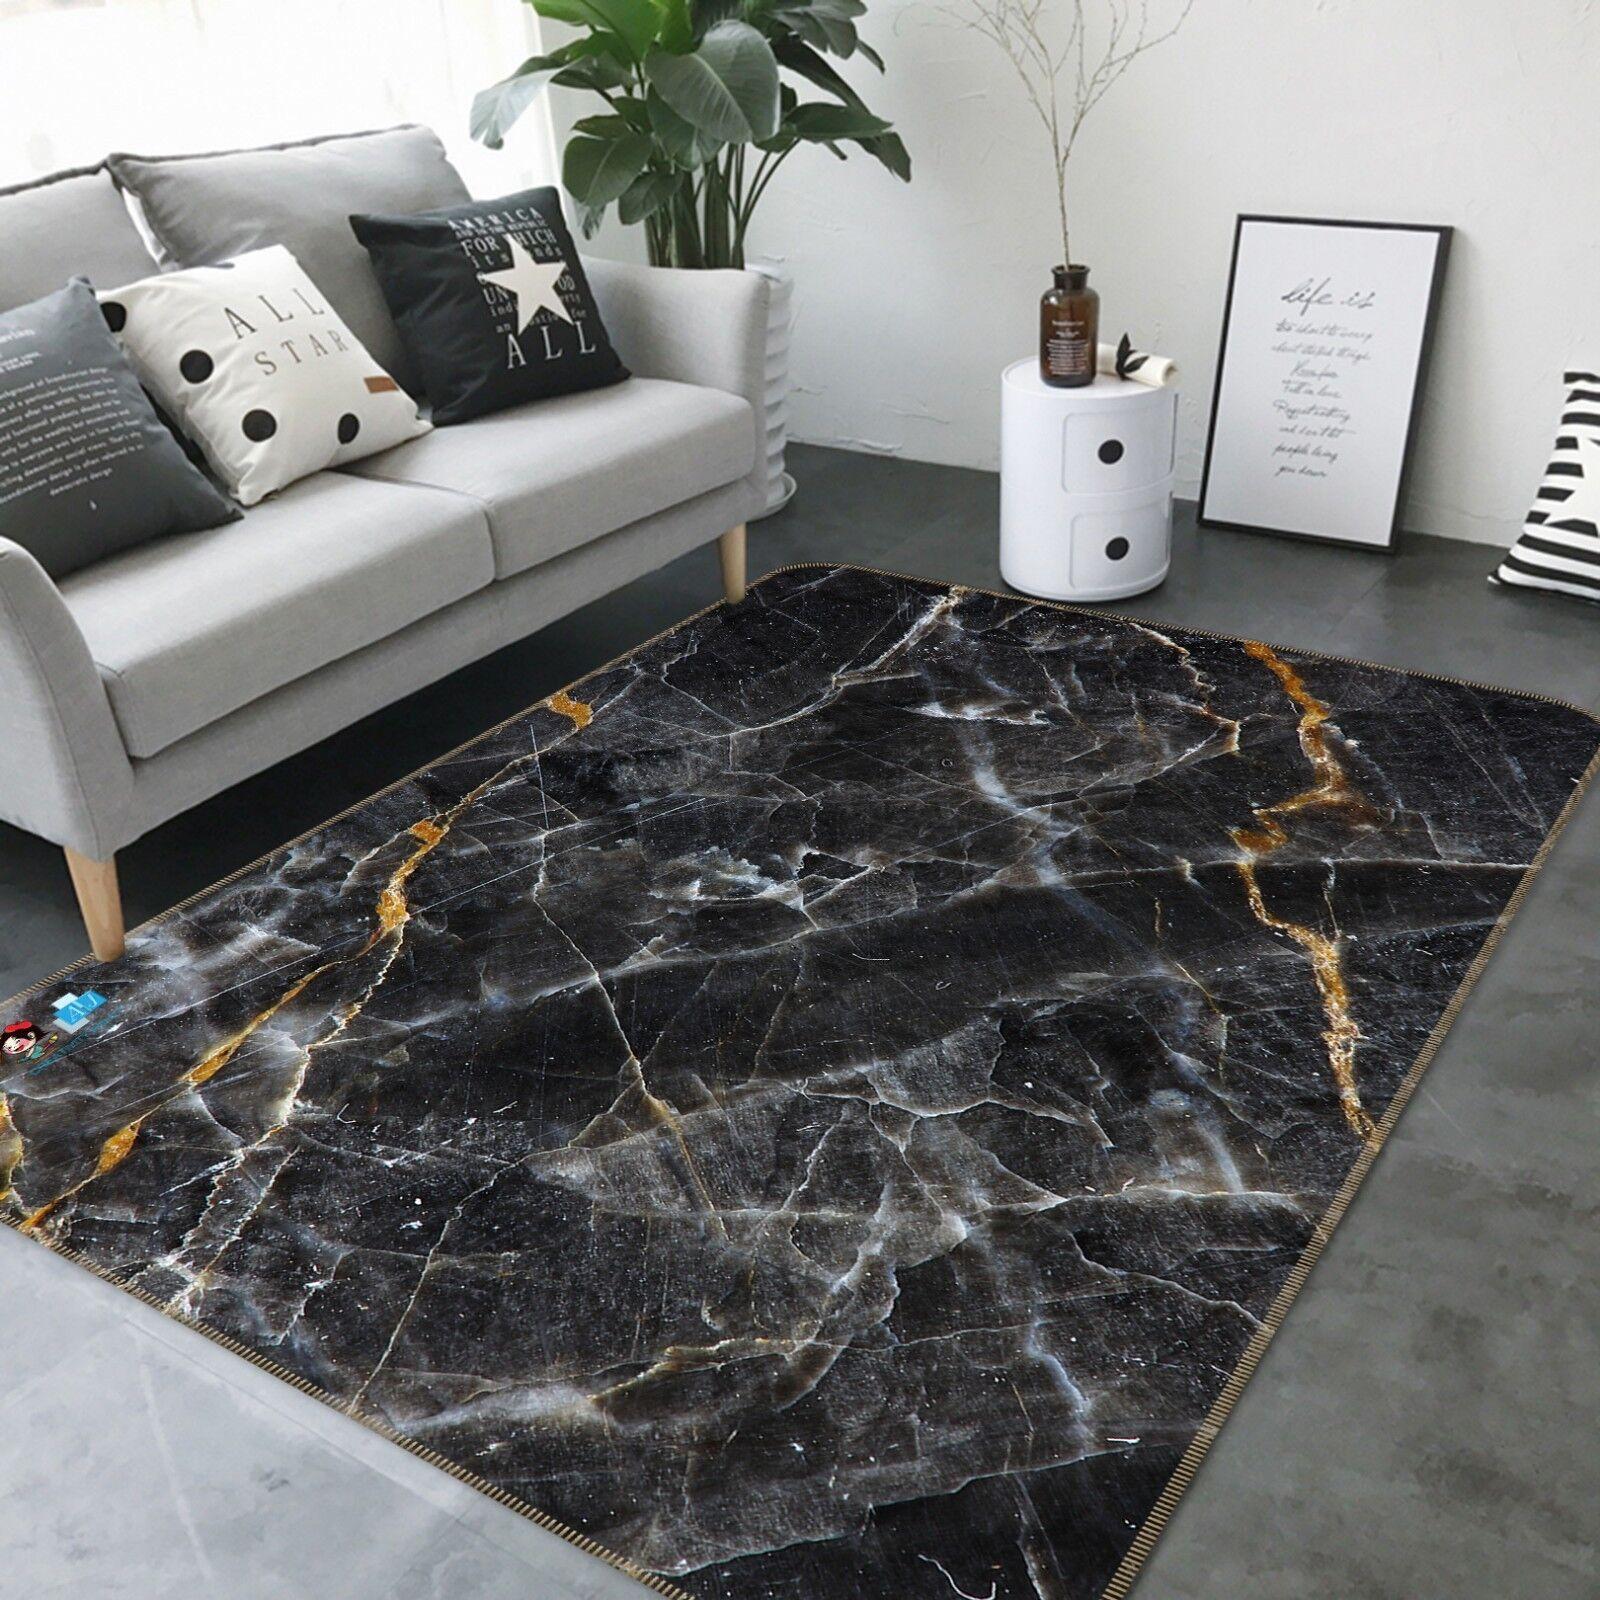 3D Nero Bianco Tile 6 tappetino antiscivolo tappeto camera Tappetino Qualità Elegante foto Tappeto UK